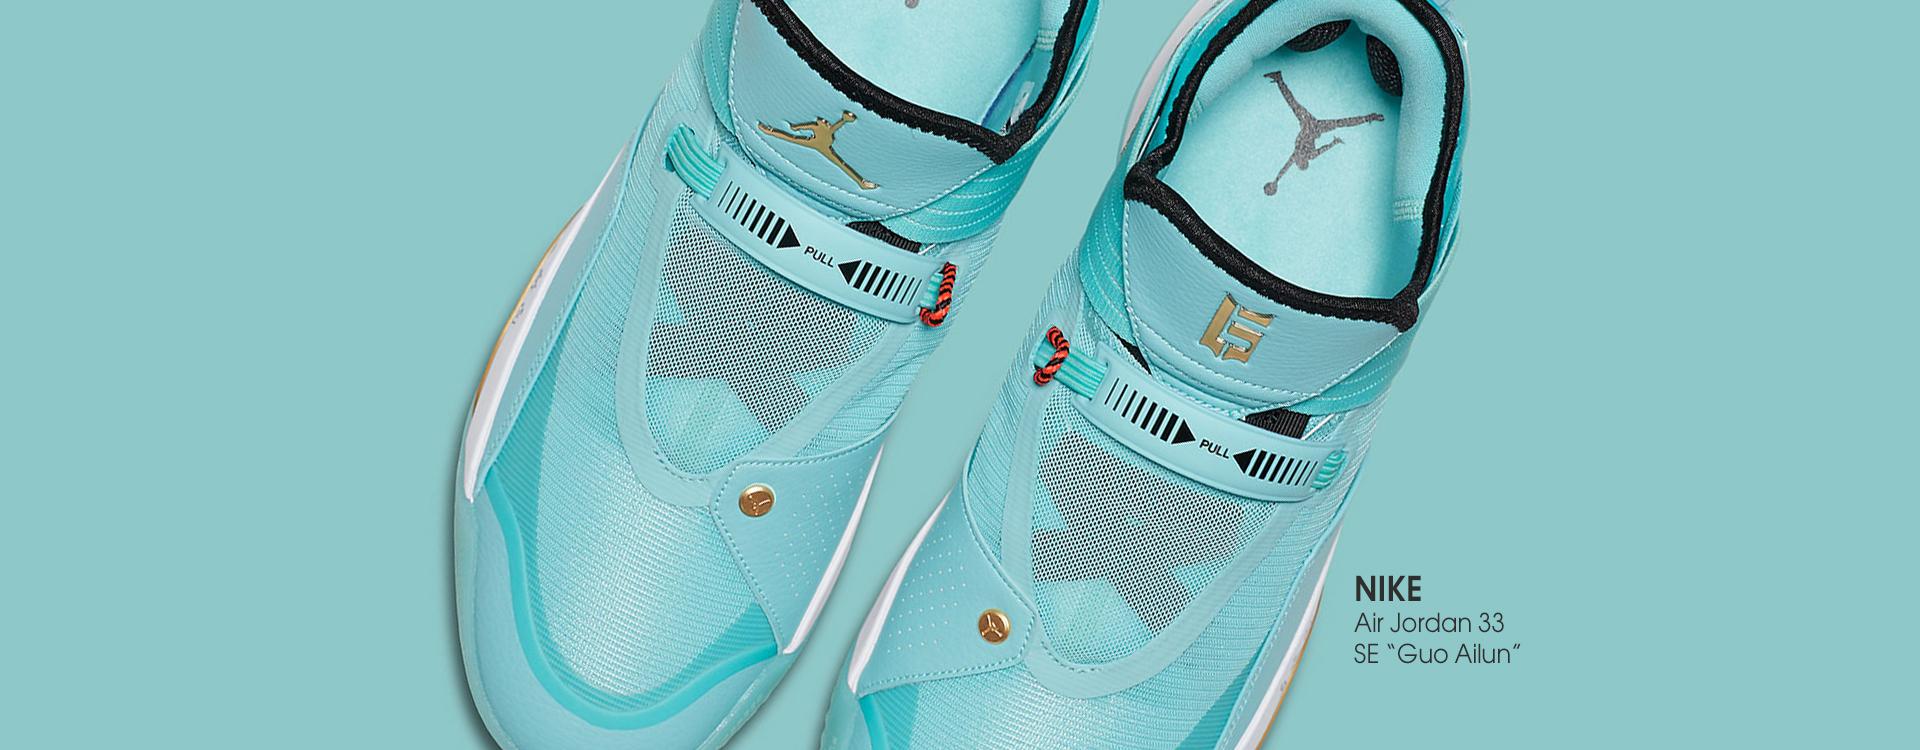 "Кроссовки Nike Air Jordan 33 SE ""Guo Ailun"""